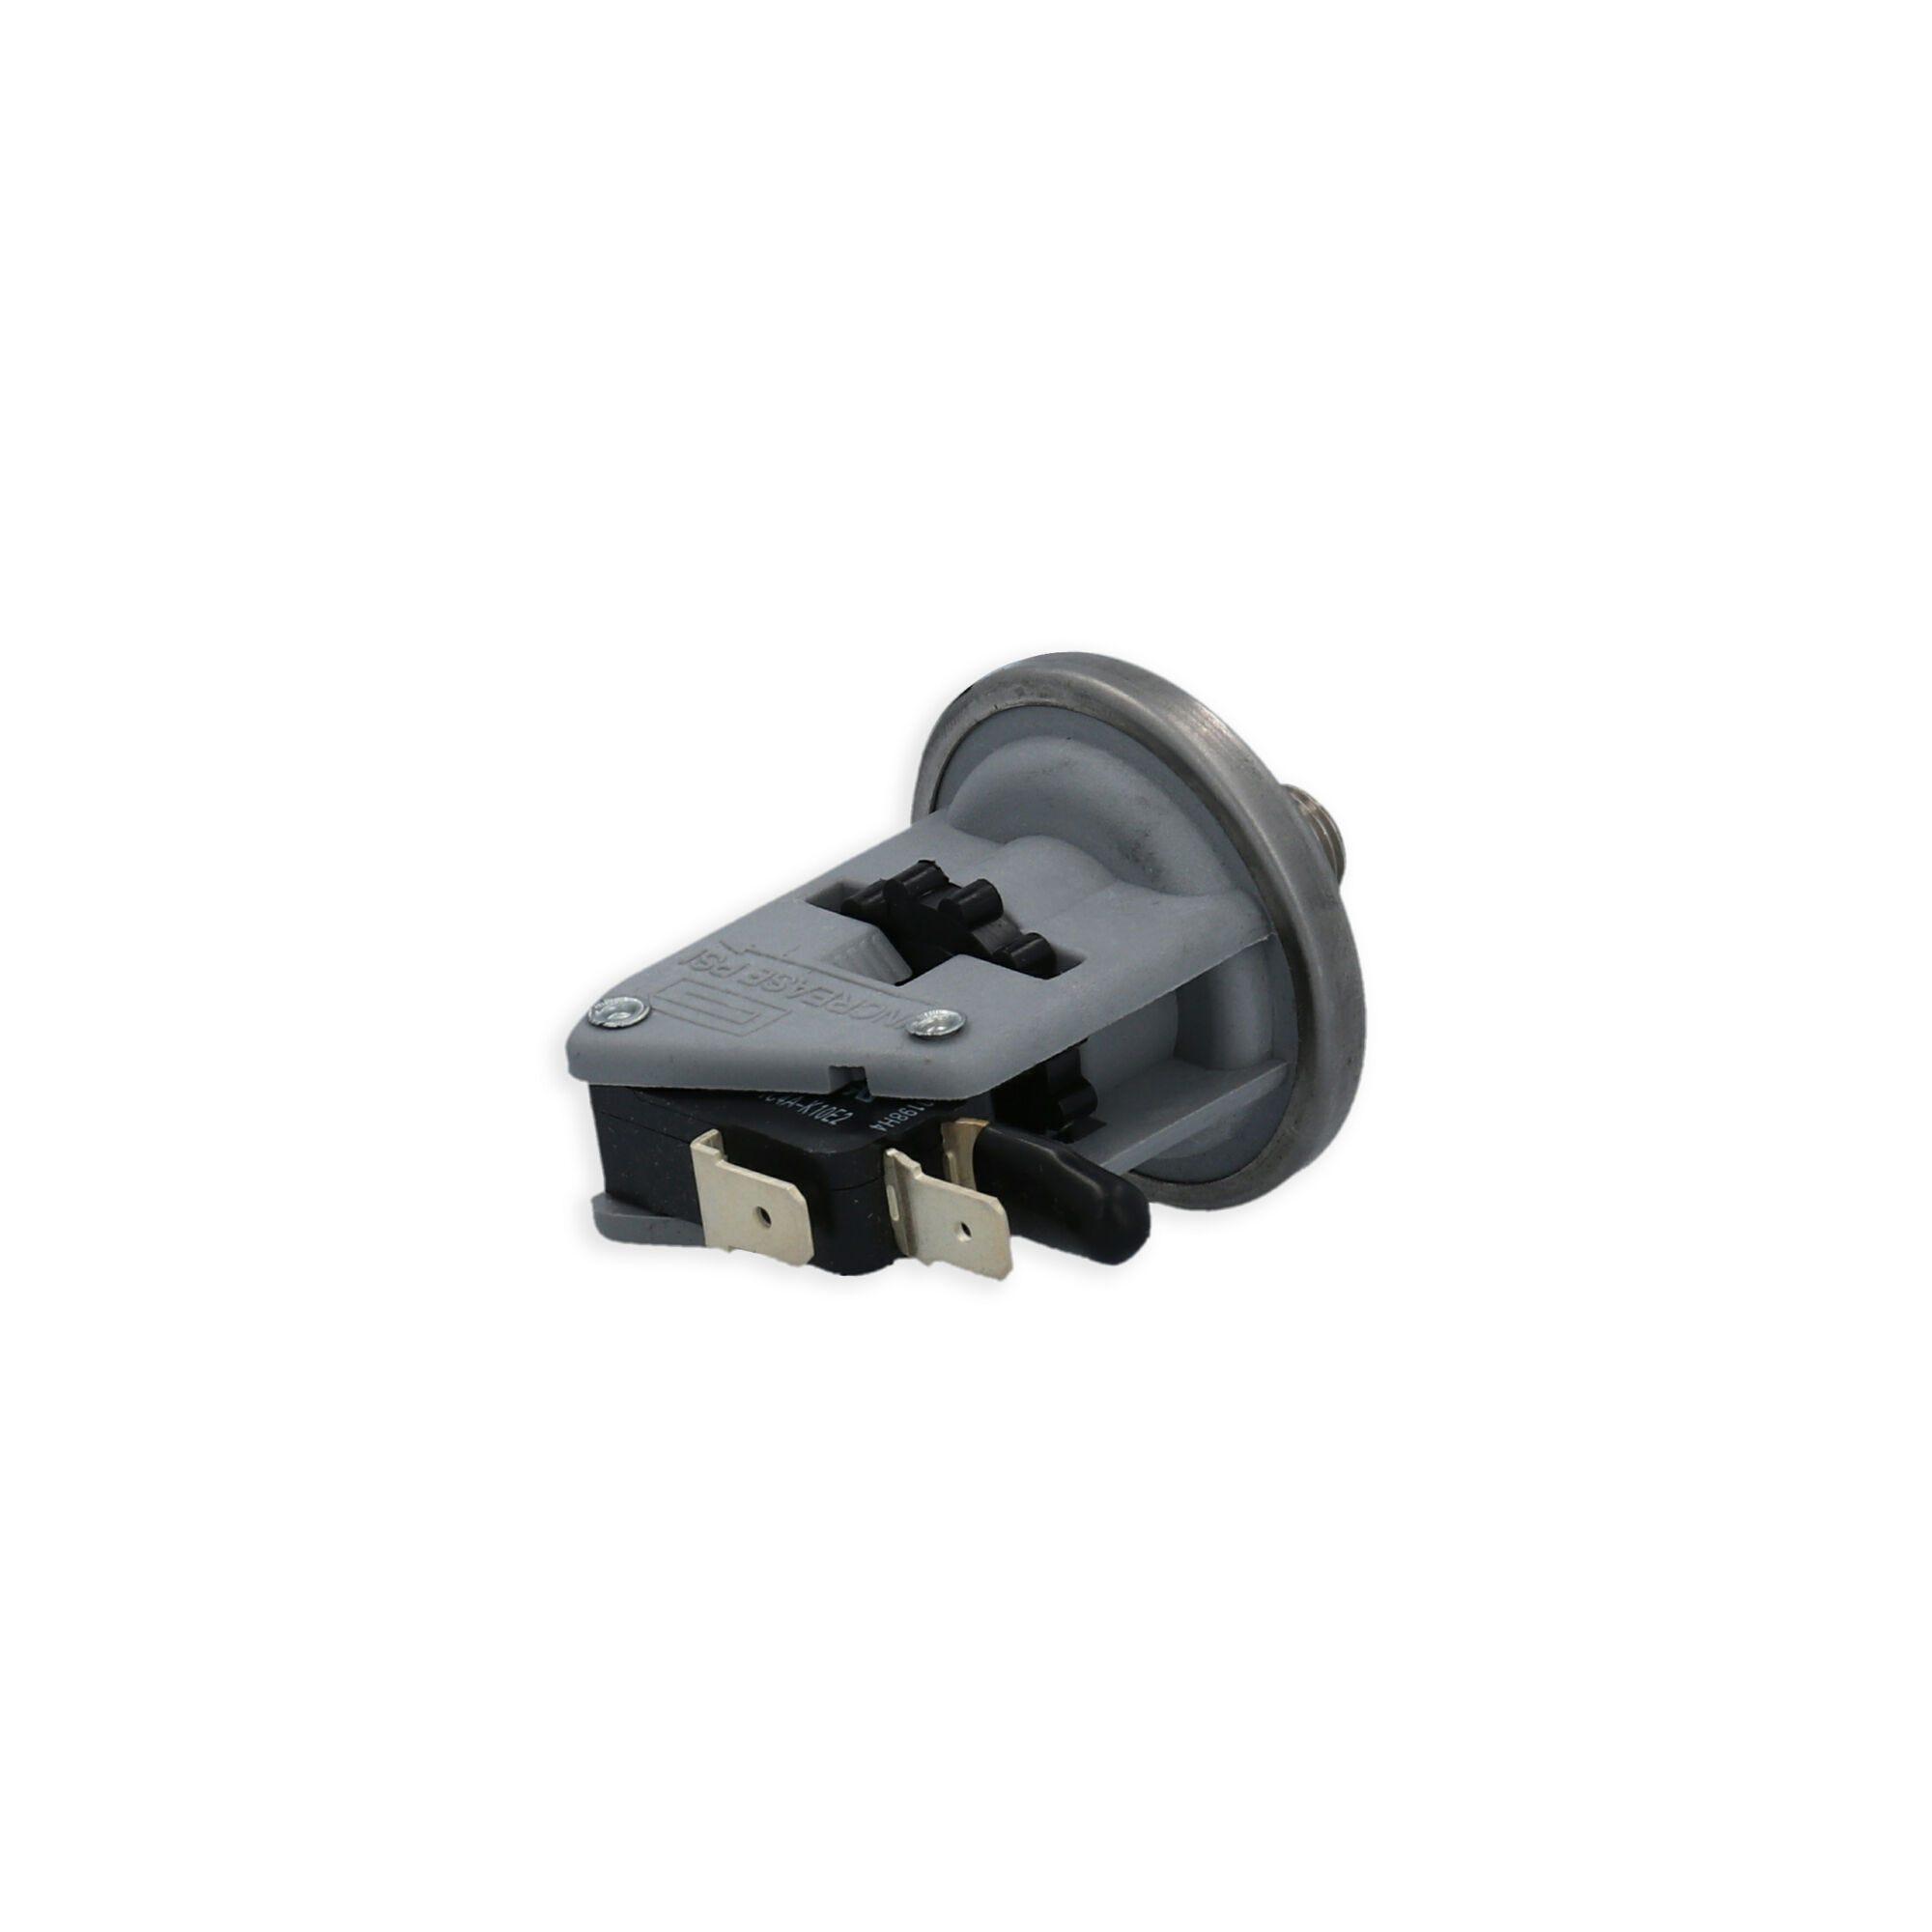 Len Gordon 800125-3 0.13 Barb 25-AMP Pressure Switch